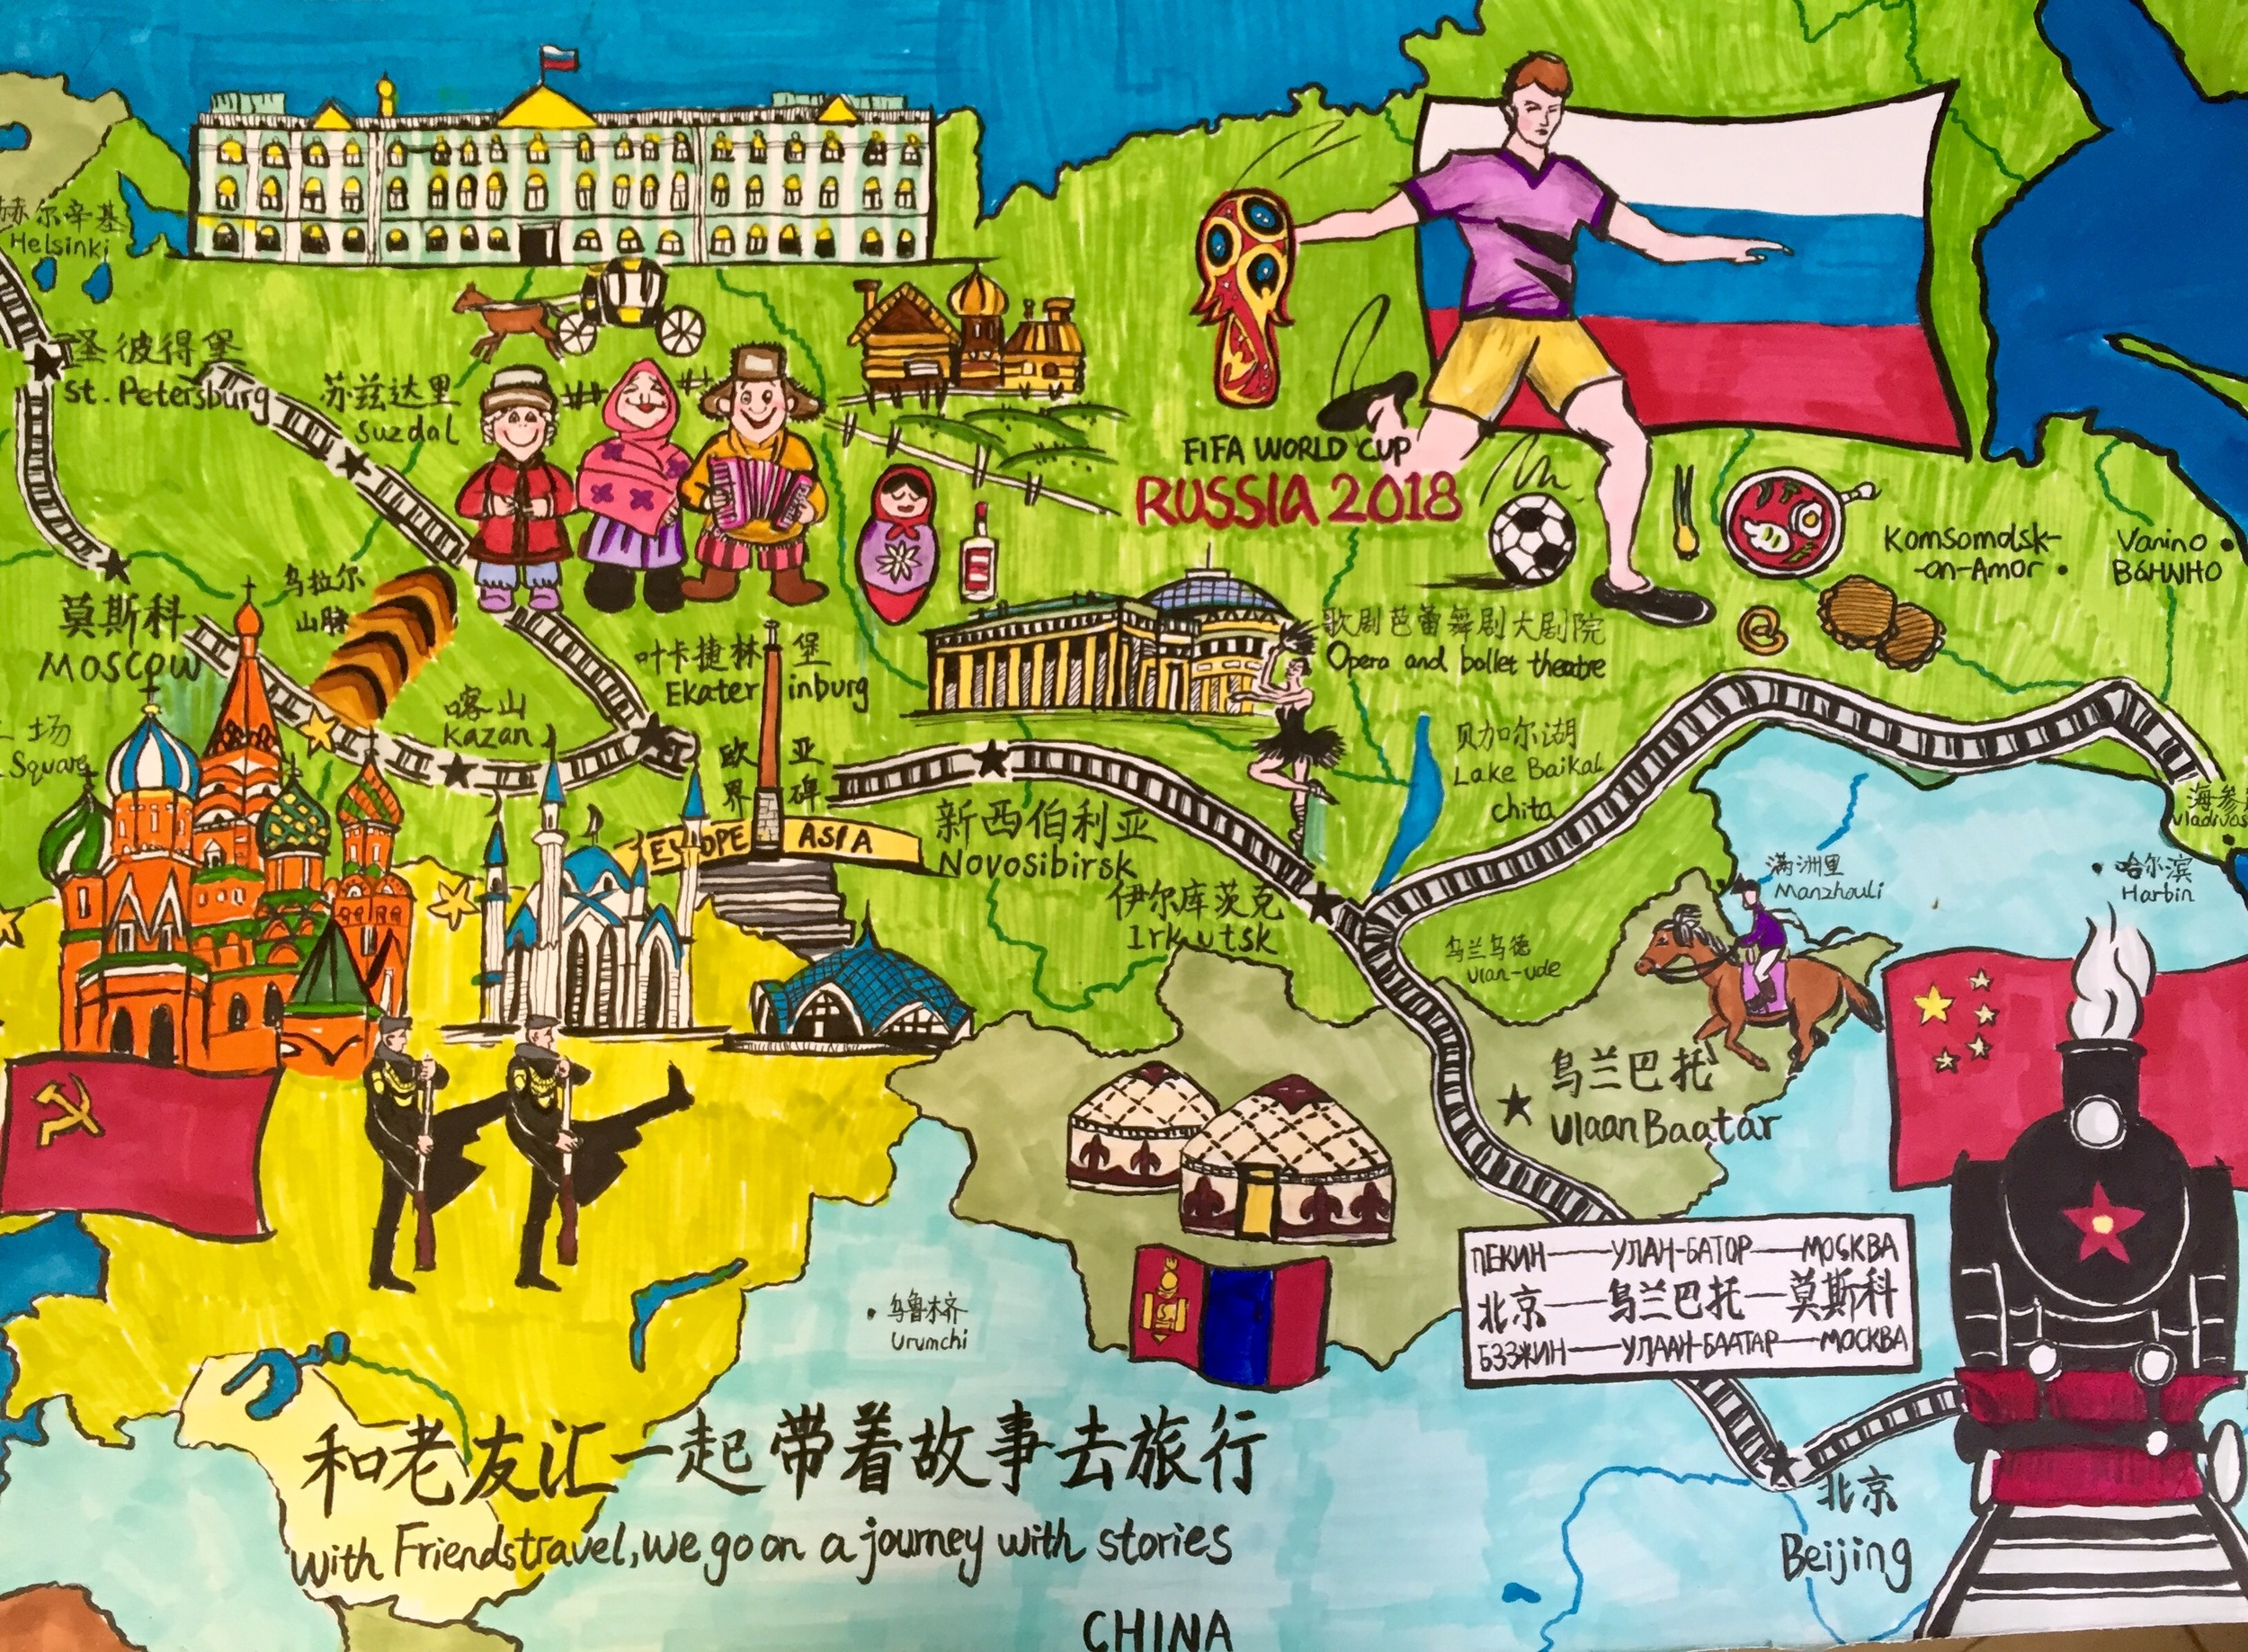 Russia Project: Map of Trans-Siberian Railway — QW Art Advisory on northern europe map, bosnia map, south america map, baikal amur mainline, wales map, st thomas map, arctic ocean map, trans-siberian railway panorama, west siberian railway, brazil map, republic of georgia map, india map, orient express, cyprus map, central asia map, south africa map, central europe map, saint petersburg, ural mountains map, west africa map, greenland map, moscow map, caribbean cruise map, caucasus mountains map, russia map,